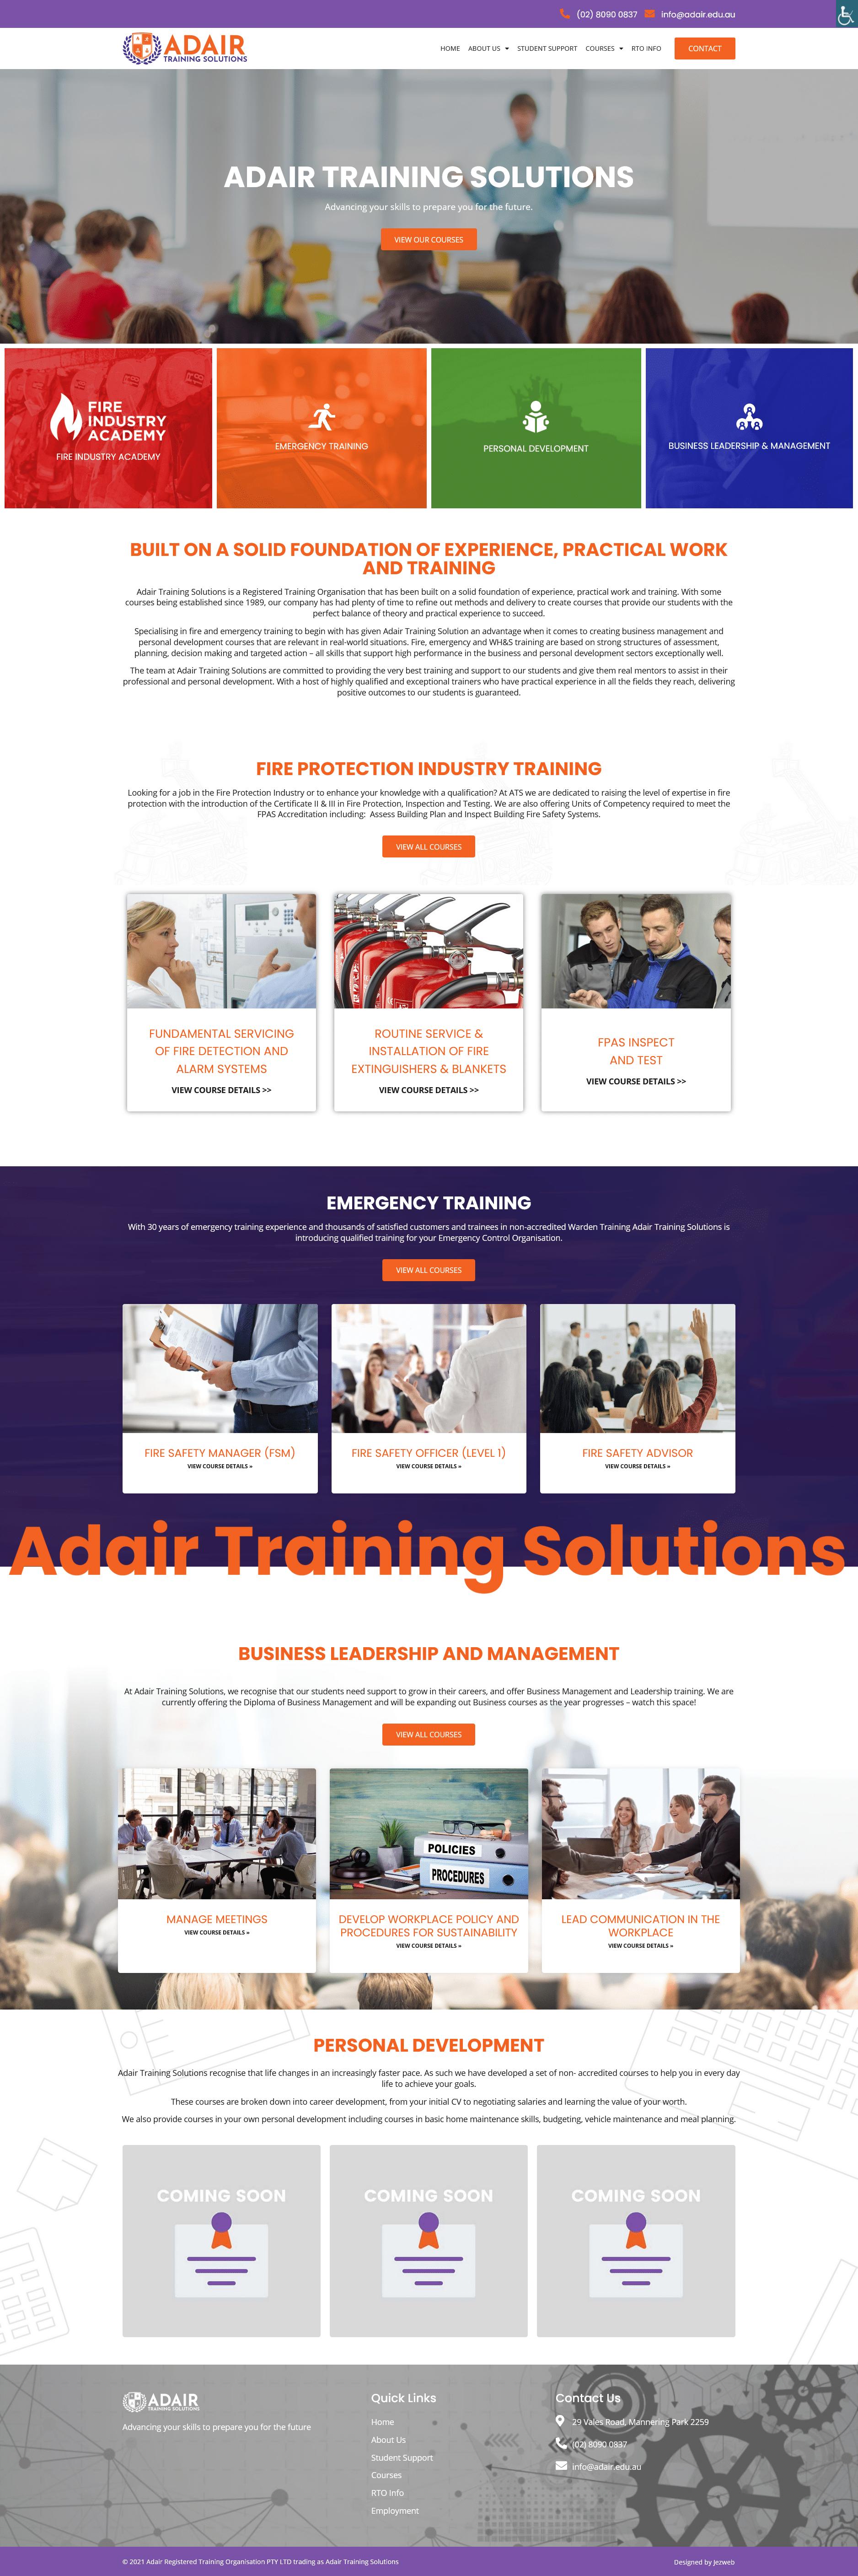 Adair Training Solutions -